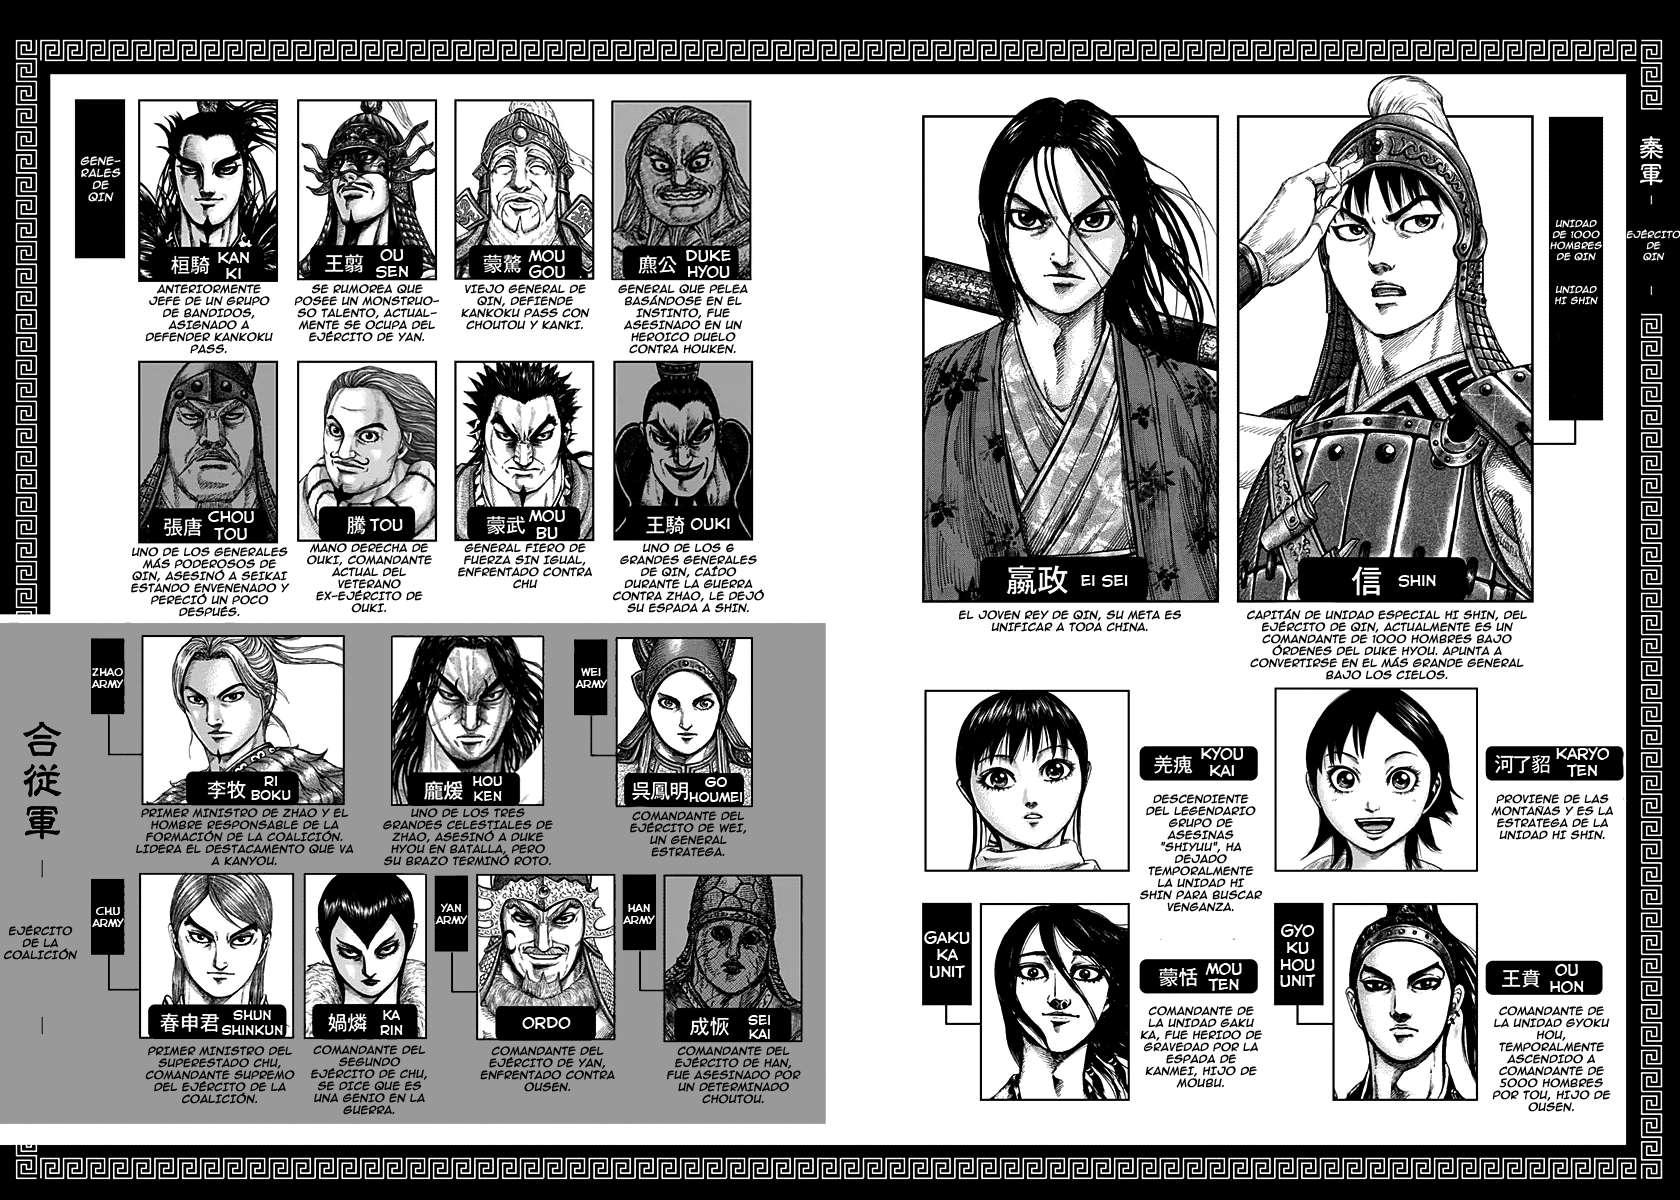 http://c5.ninemanga.com/es_manga/19/12307/360911/c12eea7b764a37778affe67c805b8e11.jpg Page 5